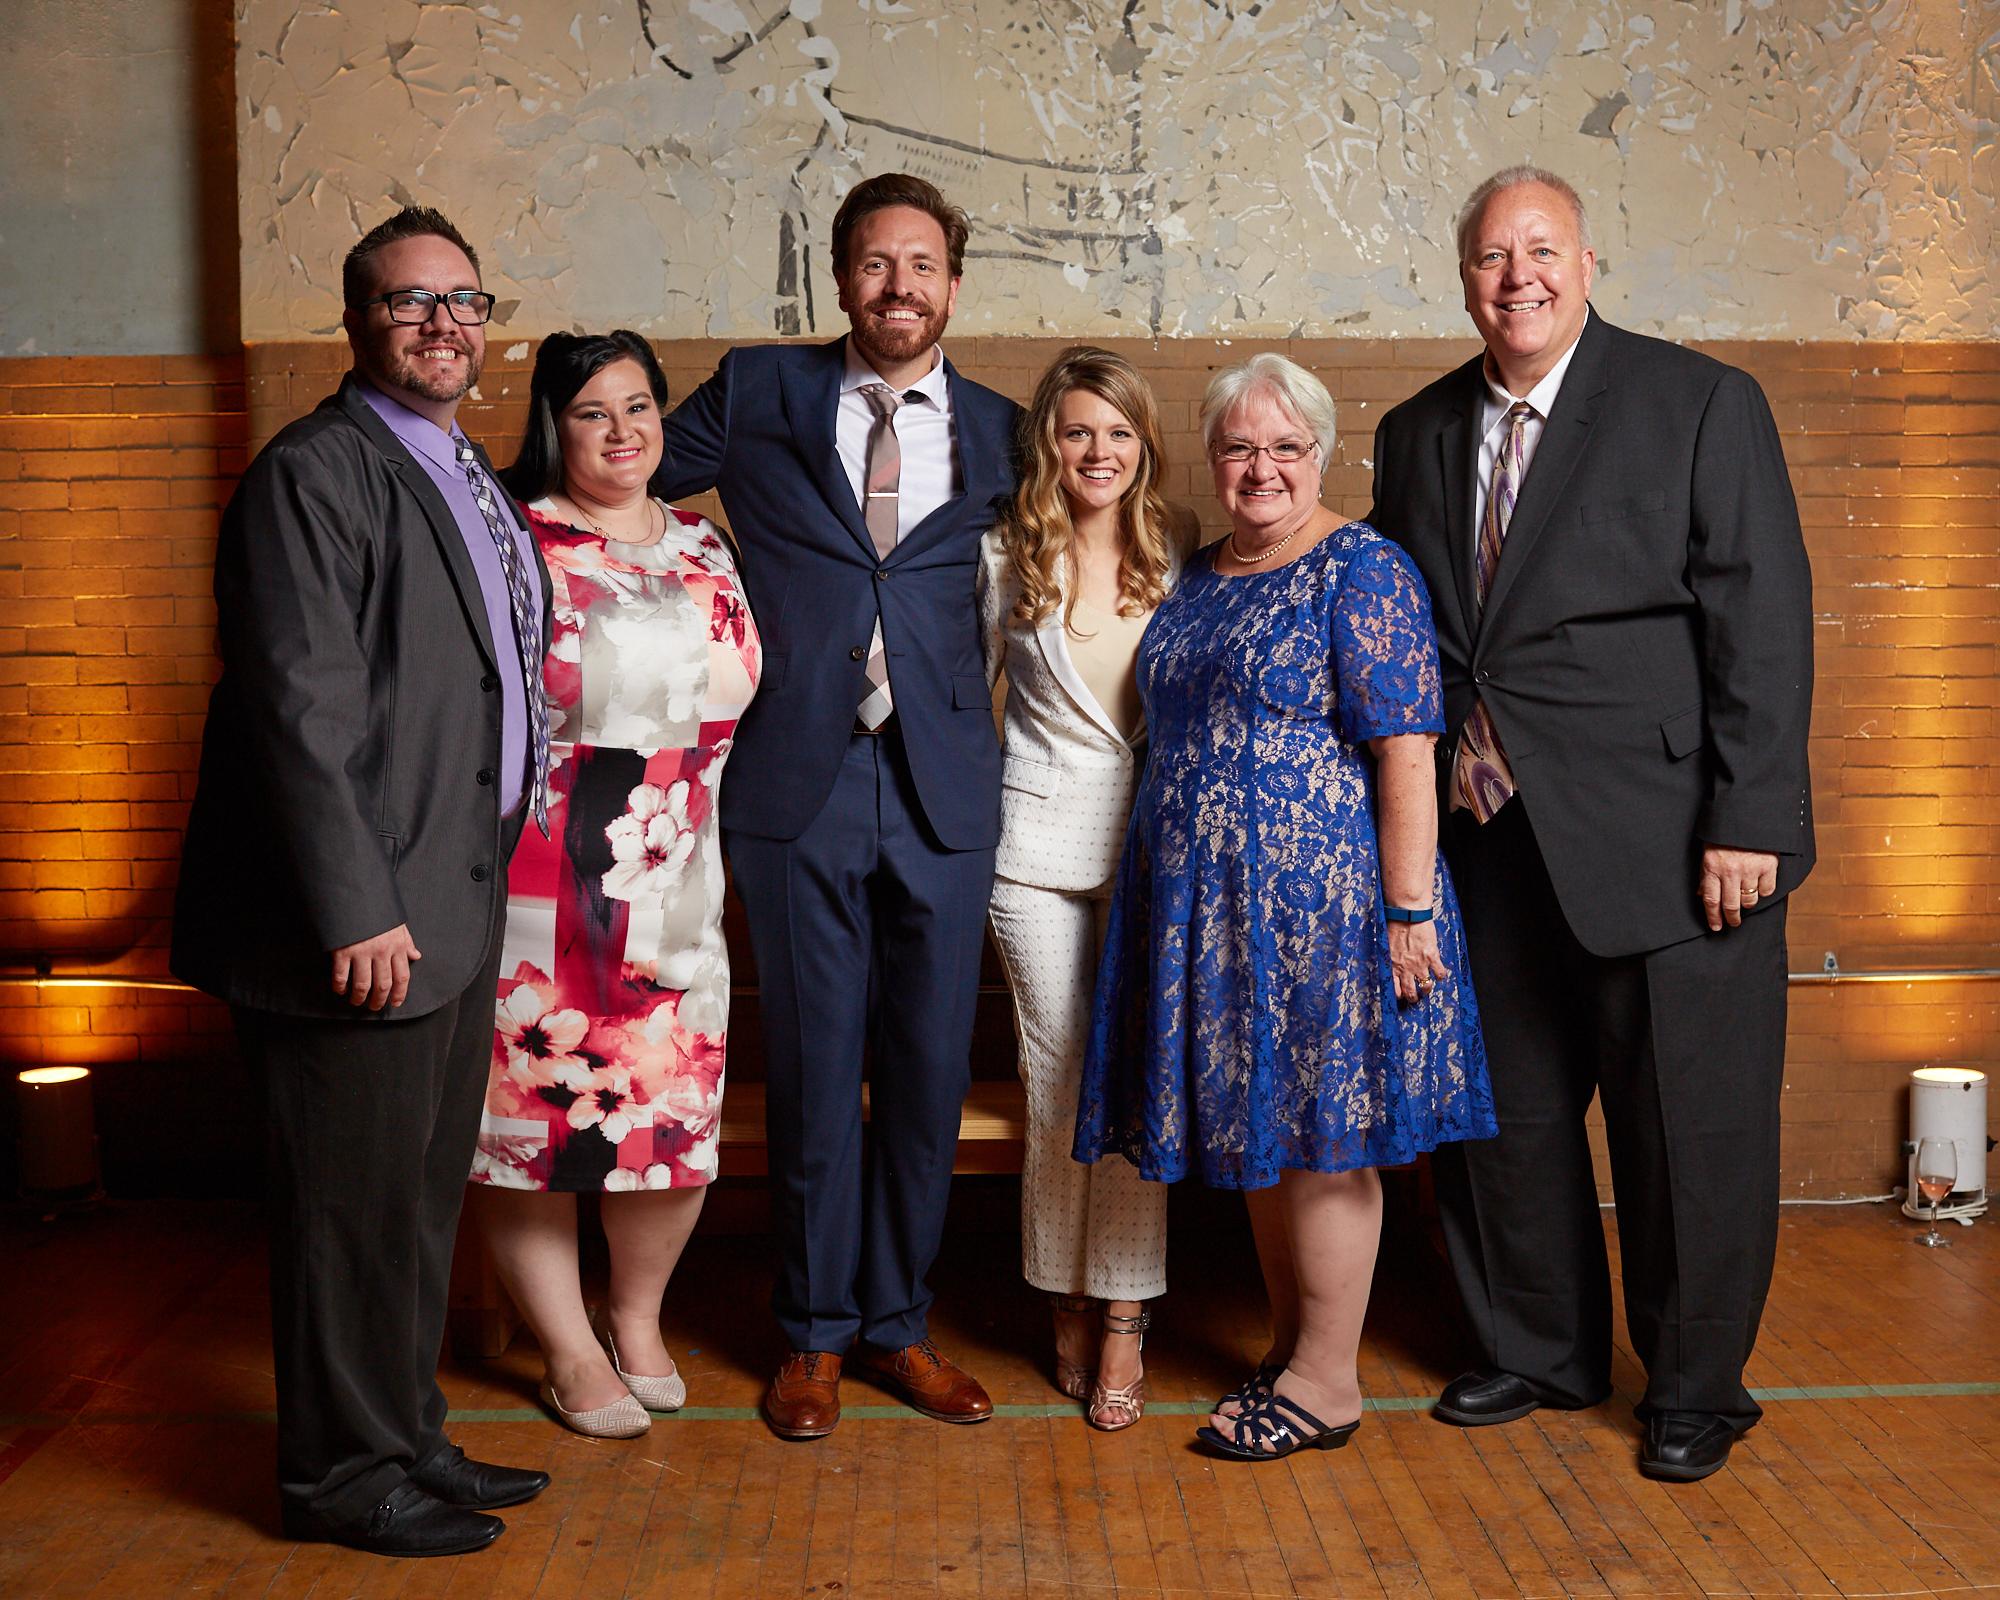 Ryan Hannah Sims - 2017.09 - Wedding Photos - 1046.jpg